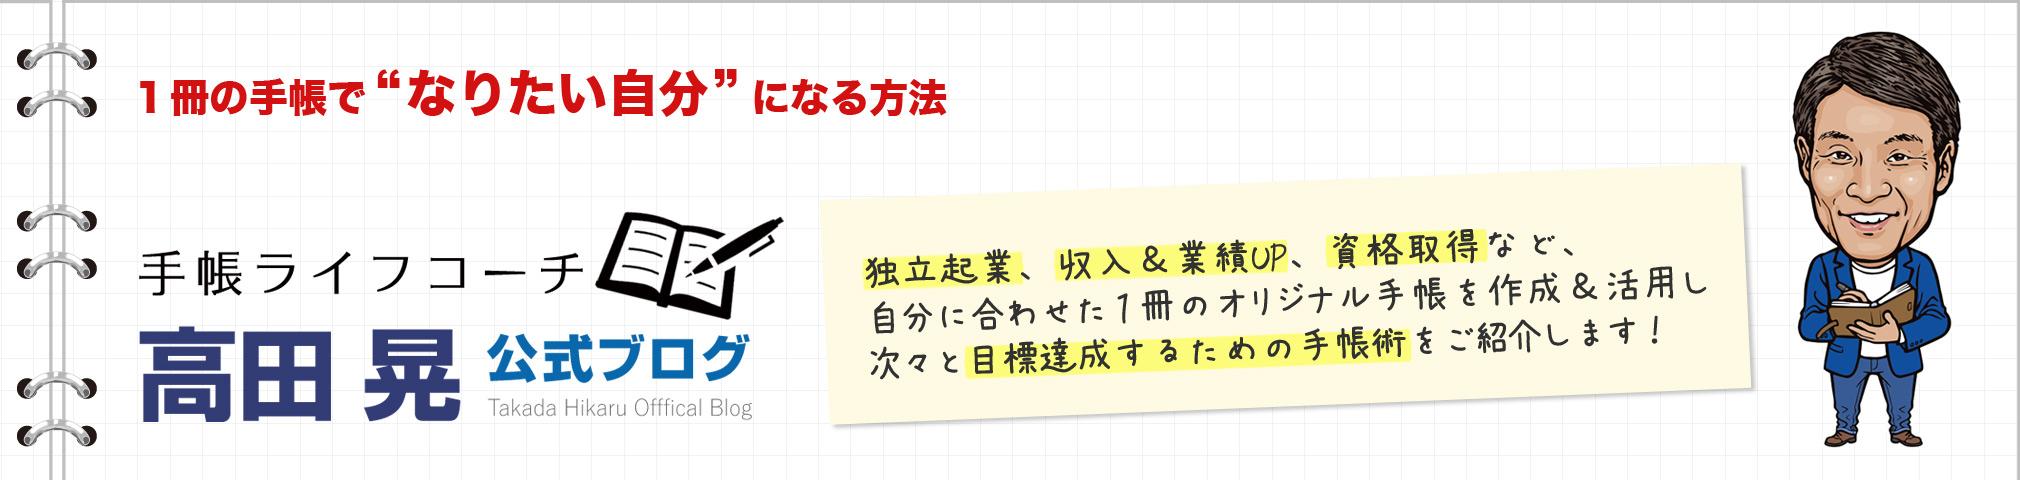 GW中に読んだ「手帳&ノート術」系のお勧め本の紹介 | 手帳ライフコーチ高田晃 公式ブログ